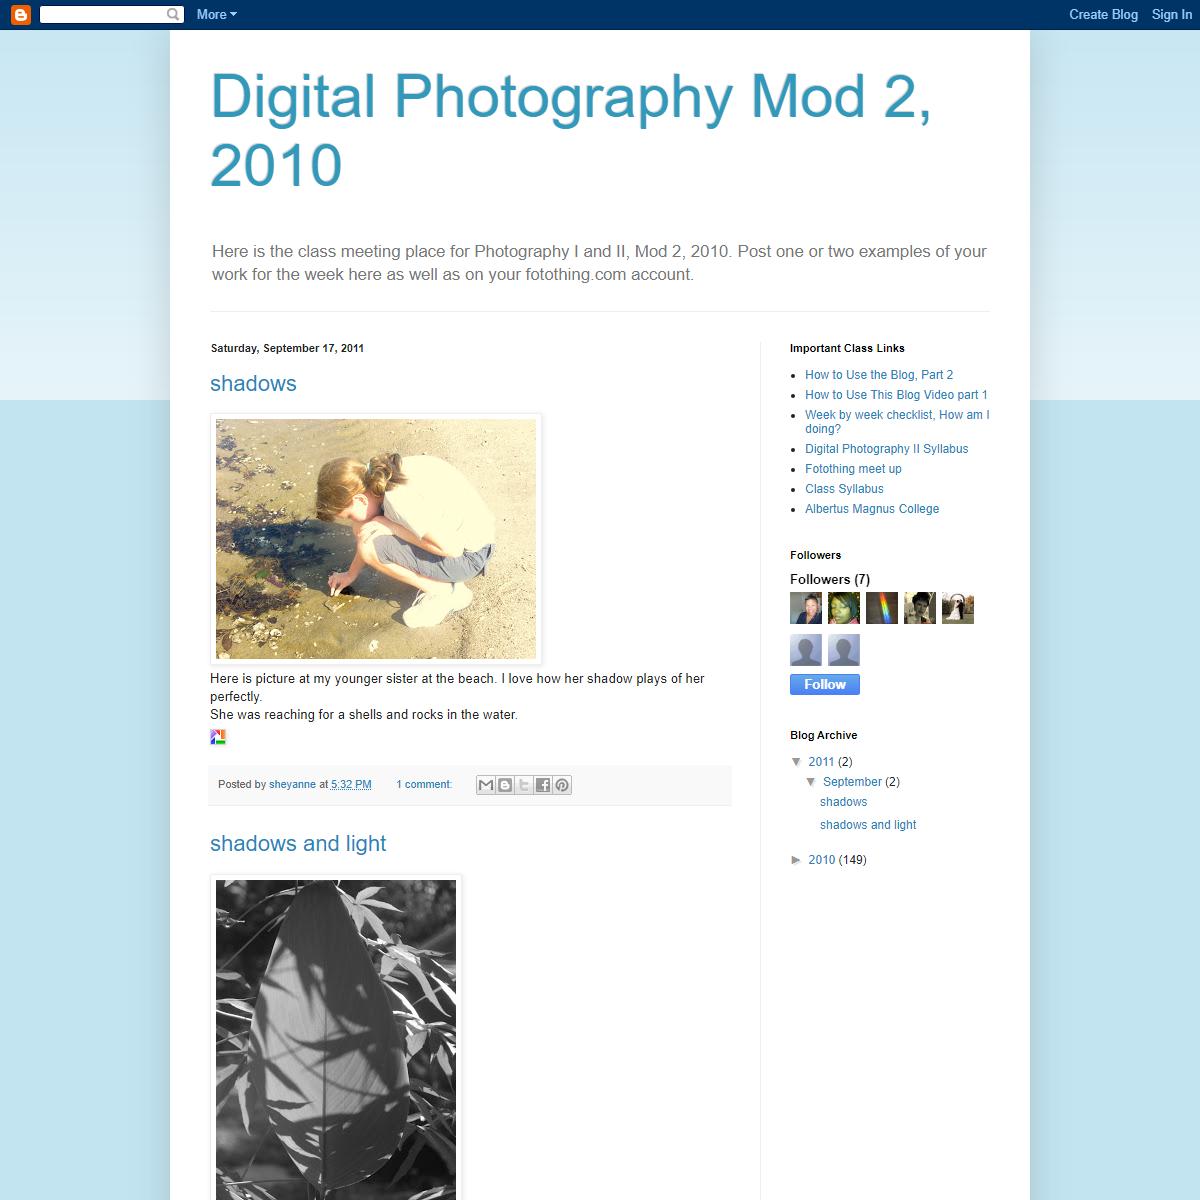 Digital Photography Mod 2, 2010